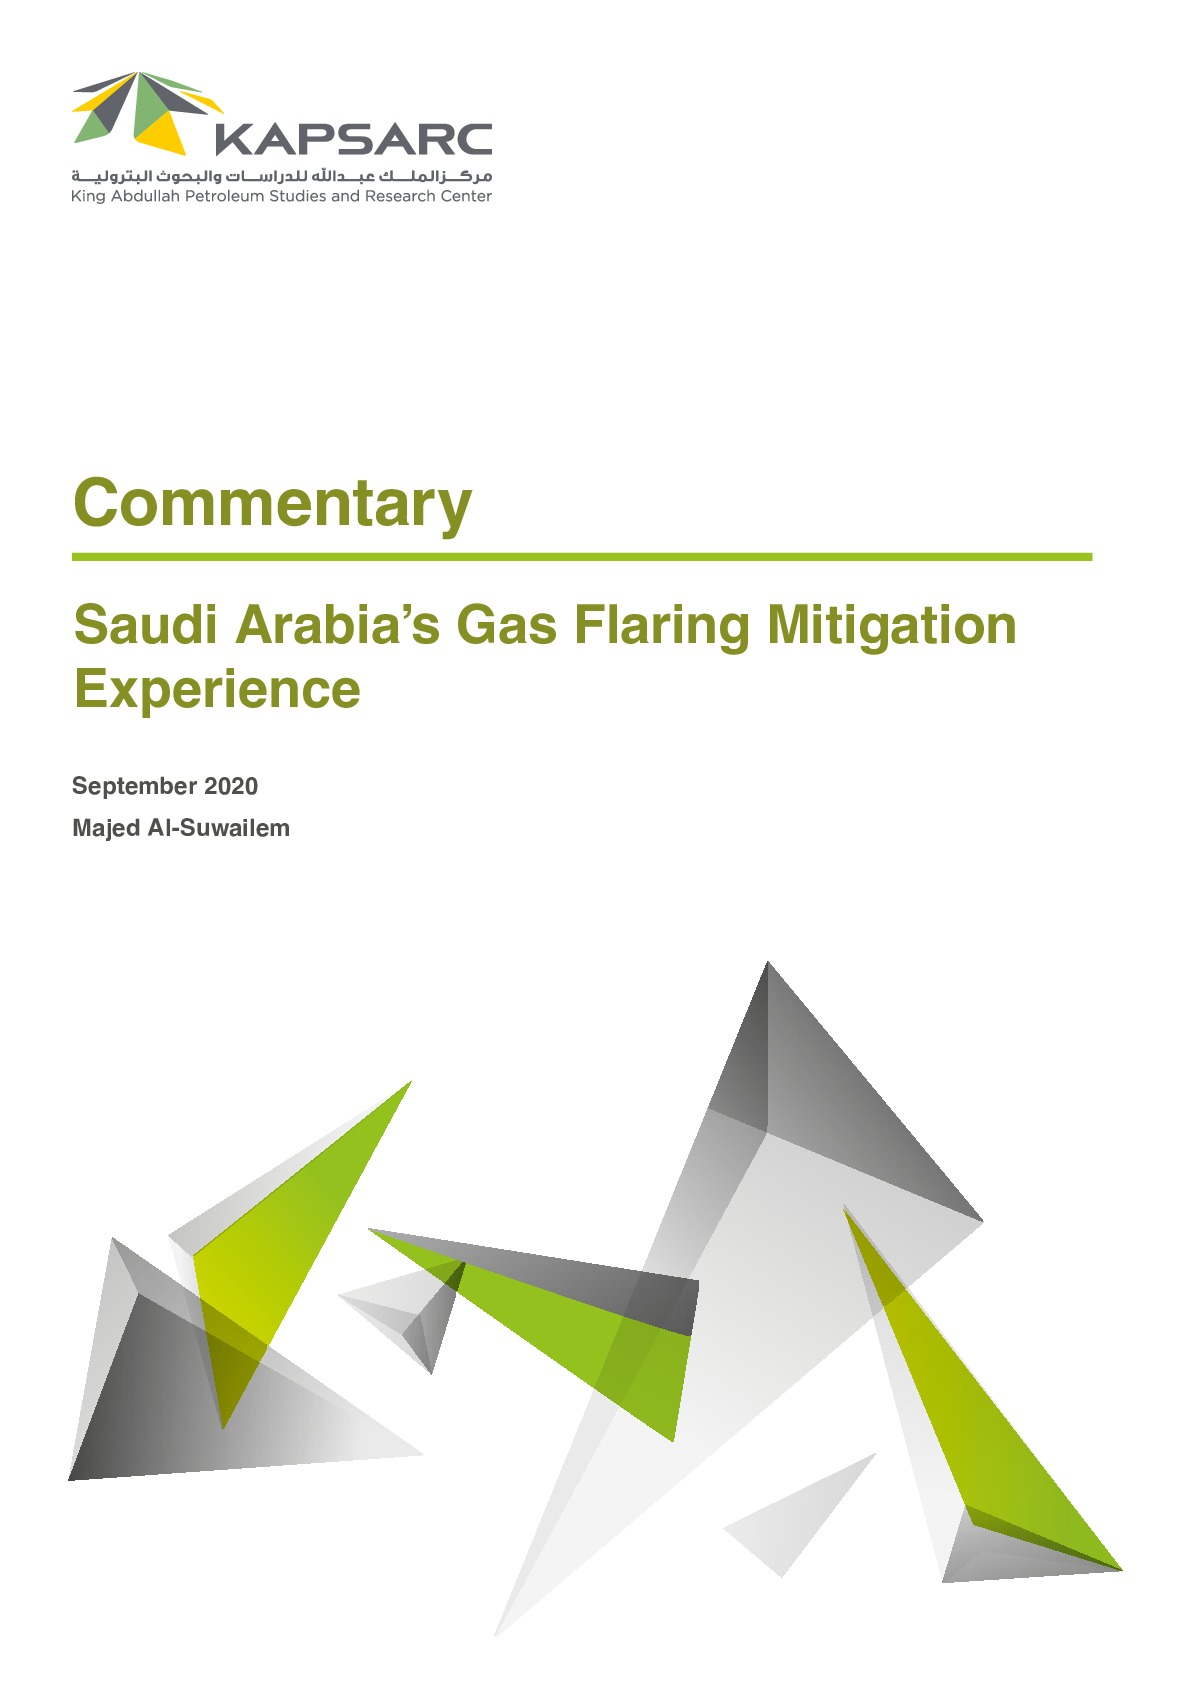 Saudi Arabia's Gas Flaring Mitigation Experience